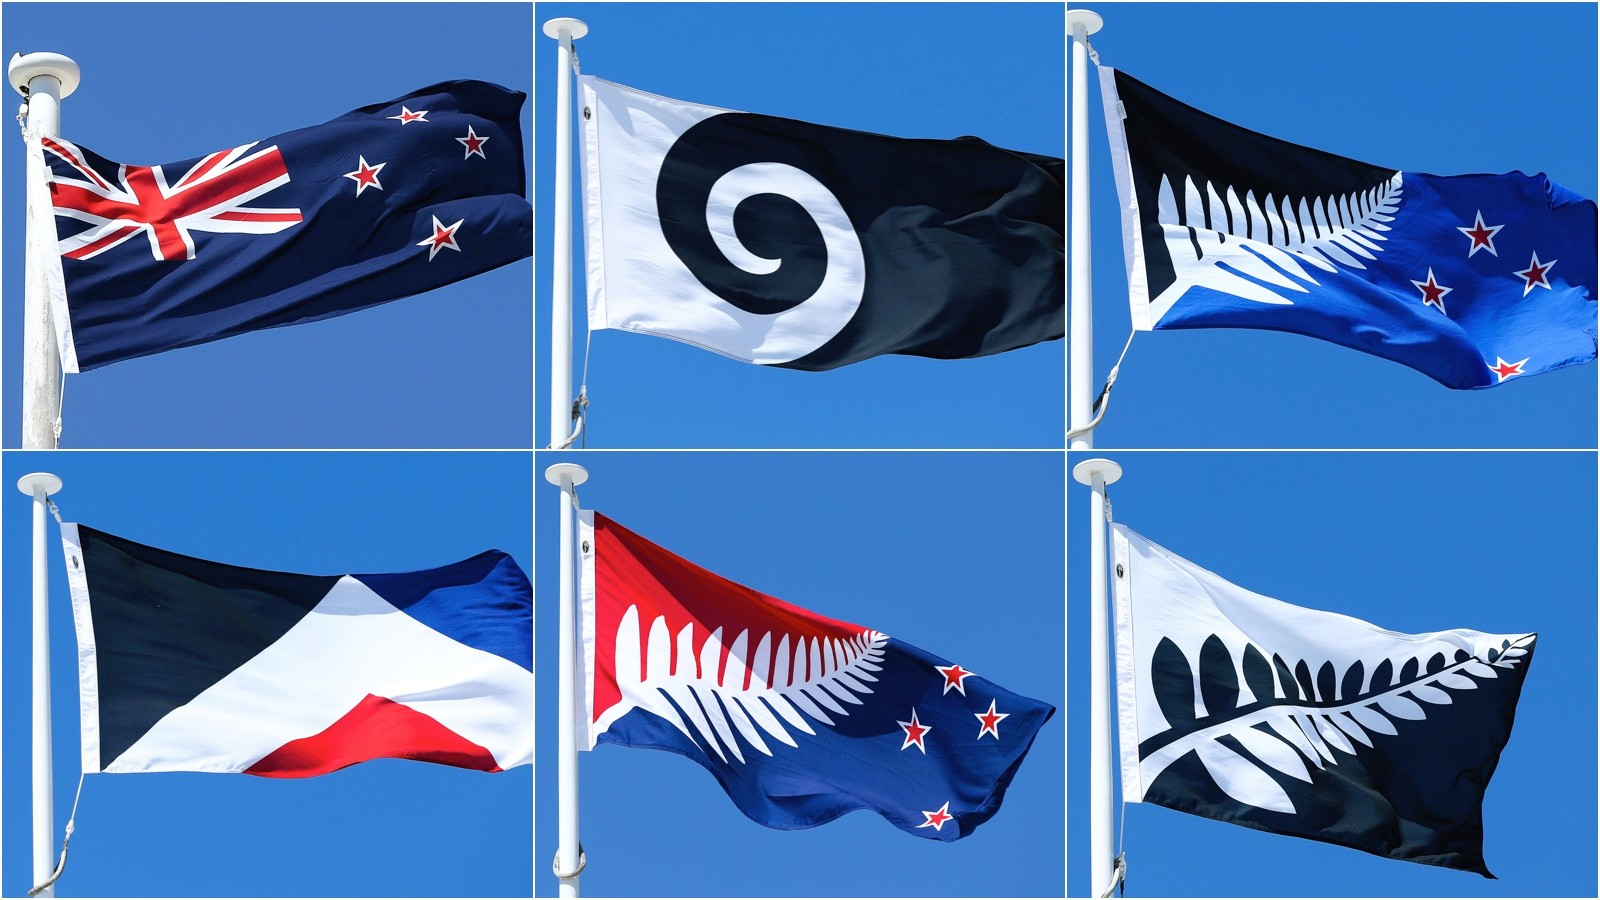 New Zealand Flag Wallpaper: New Zealand Flag Hd Wallpaper